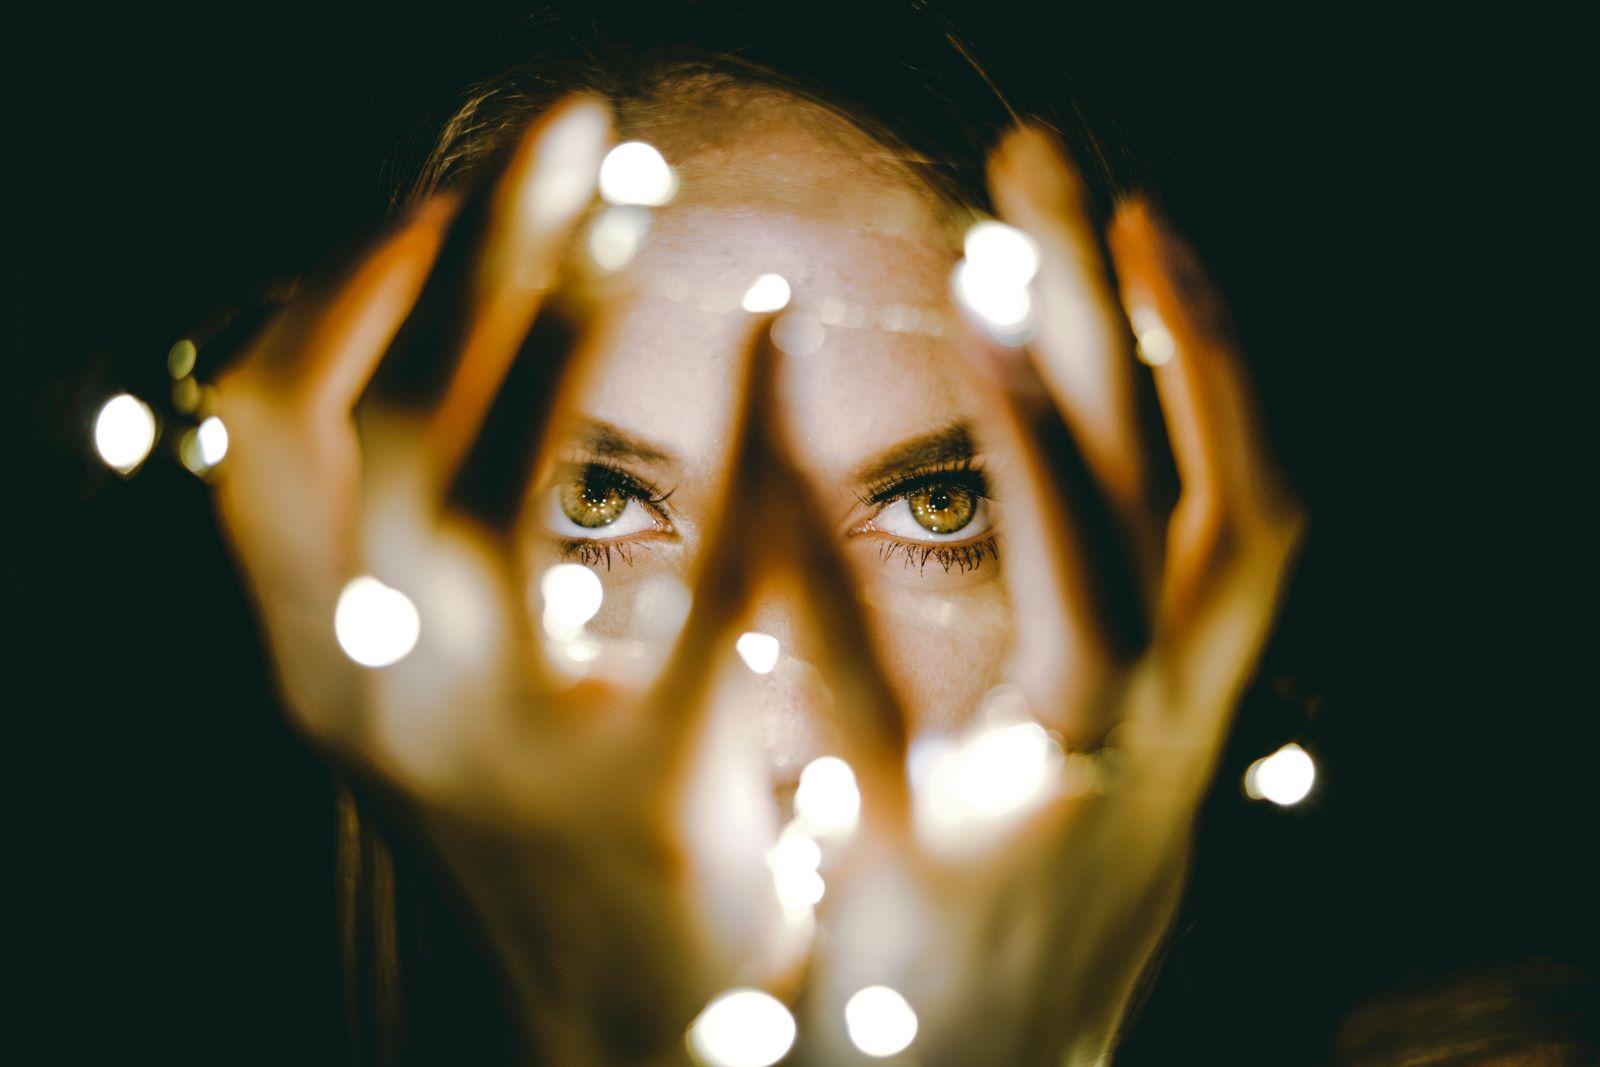 Vrouw houdt lampjesketting vast